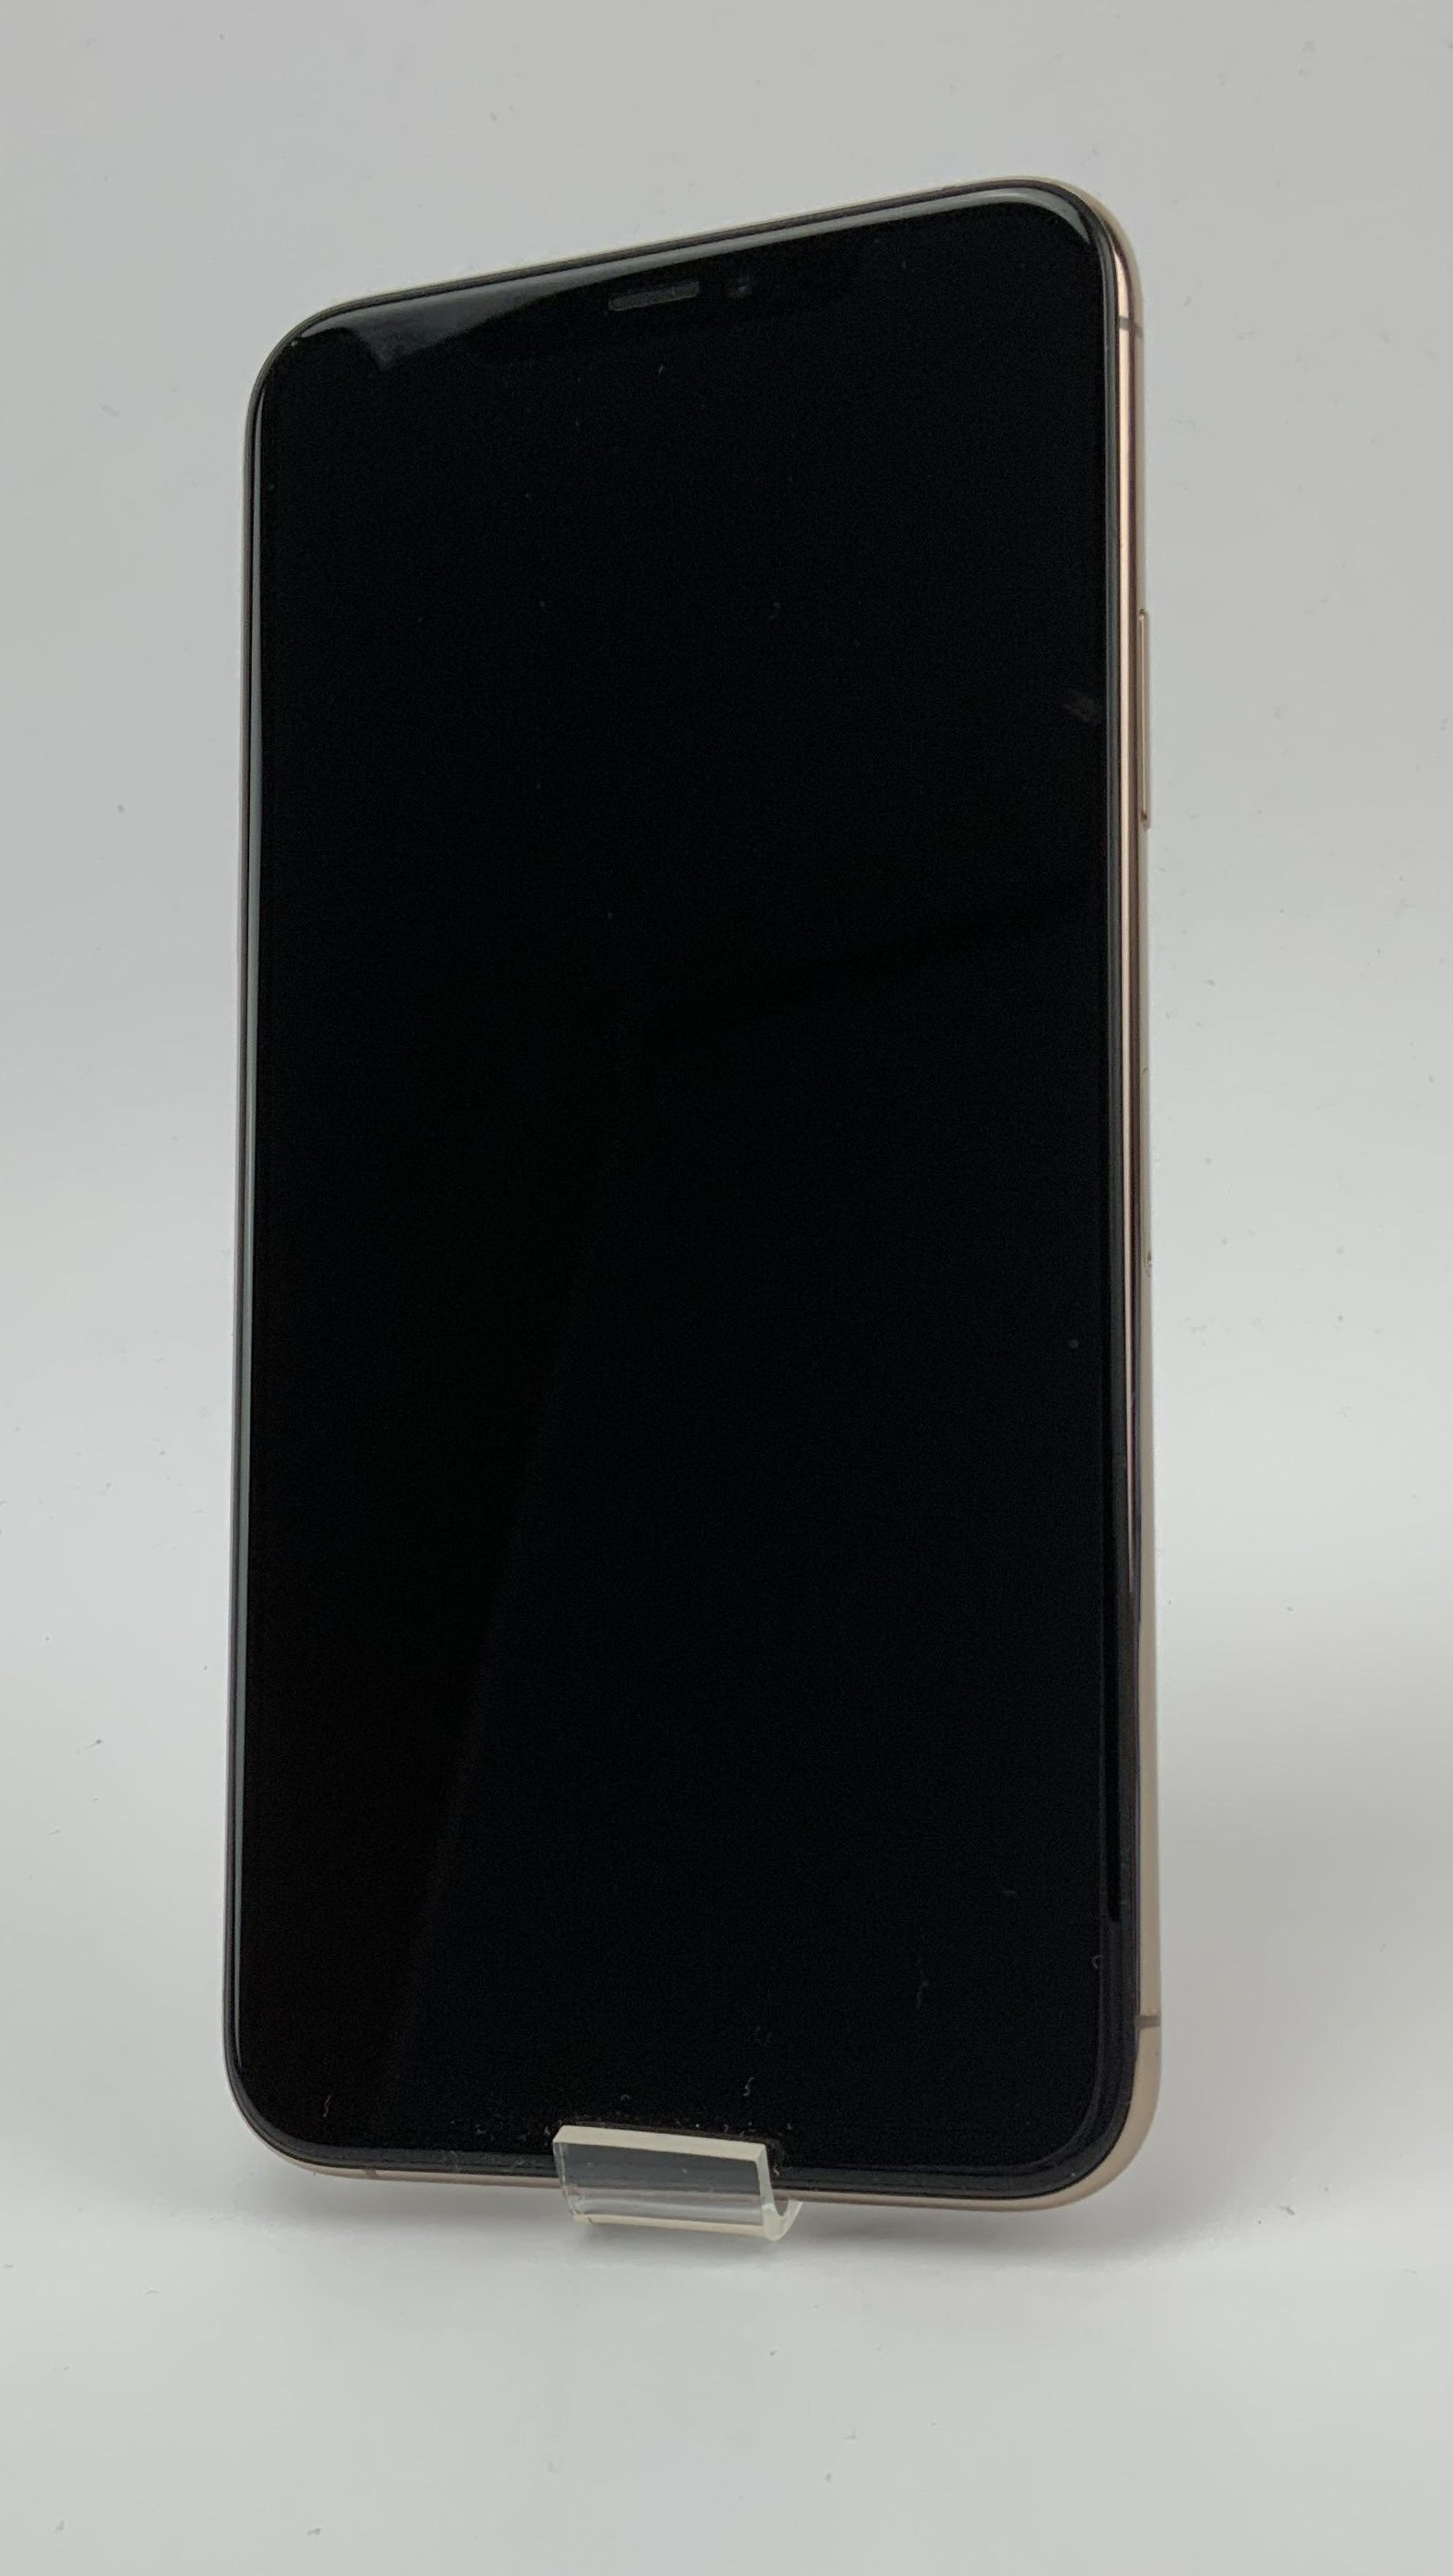 iPhone 11 Pro Max 64GB, 64GB, Gold, immagine 1